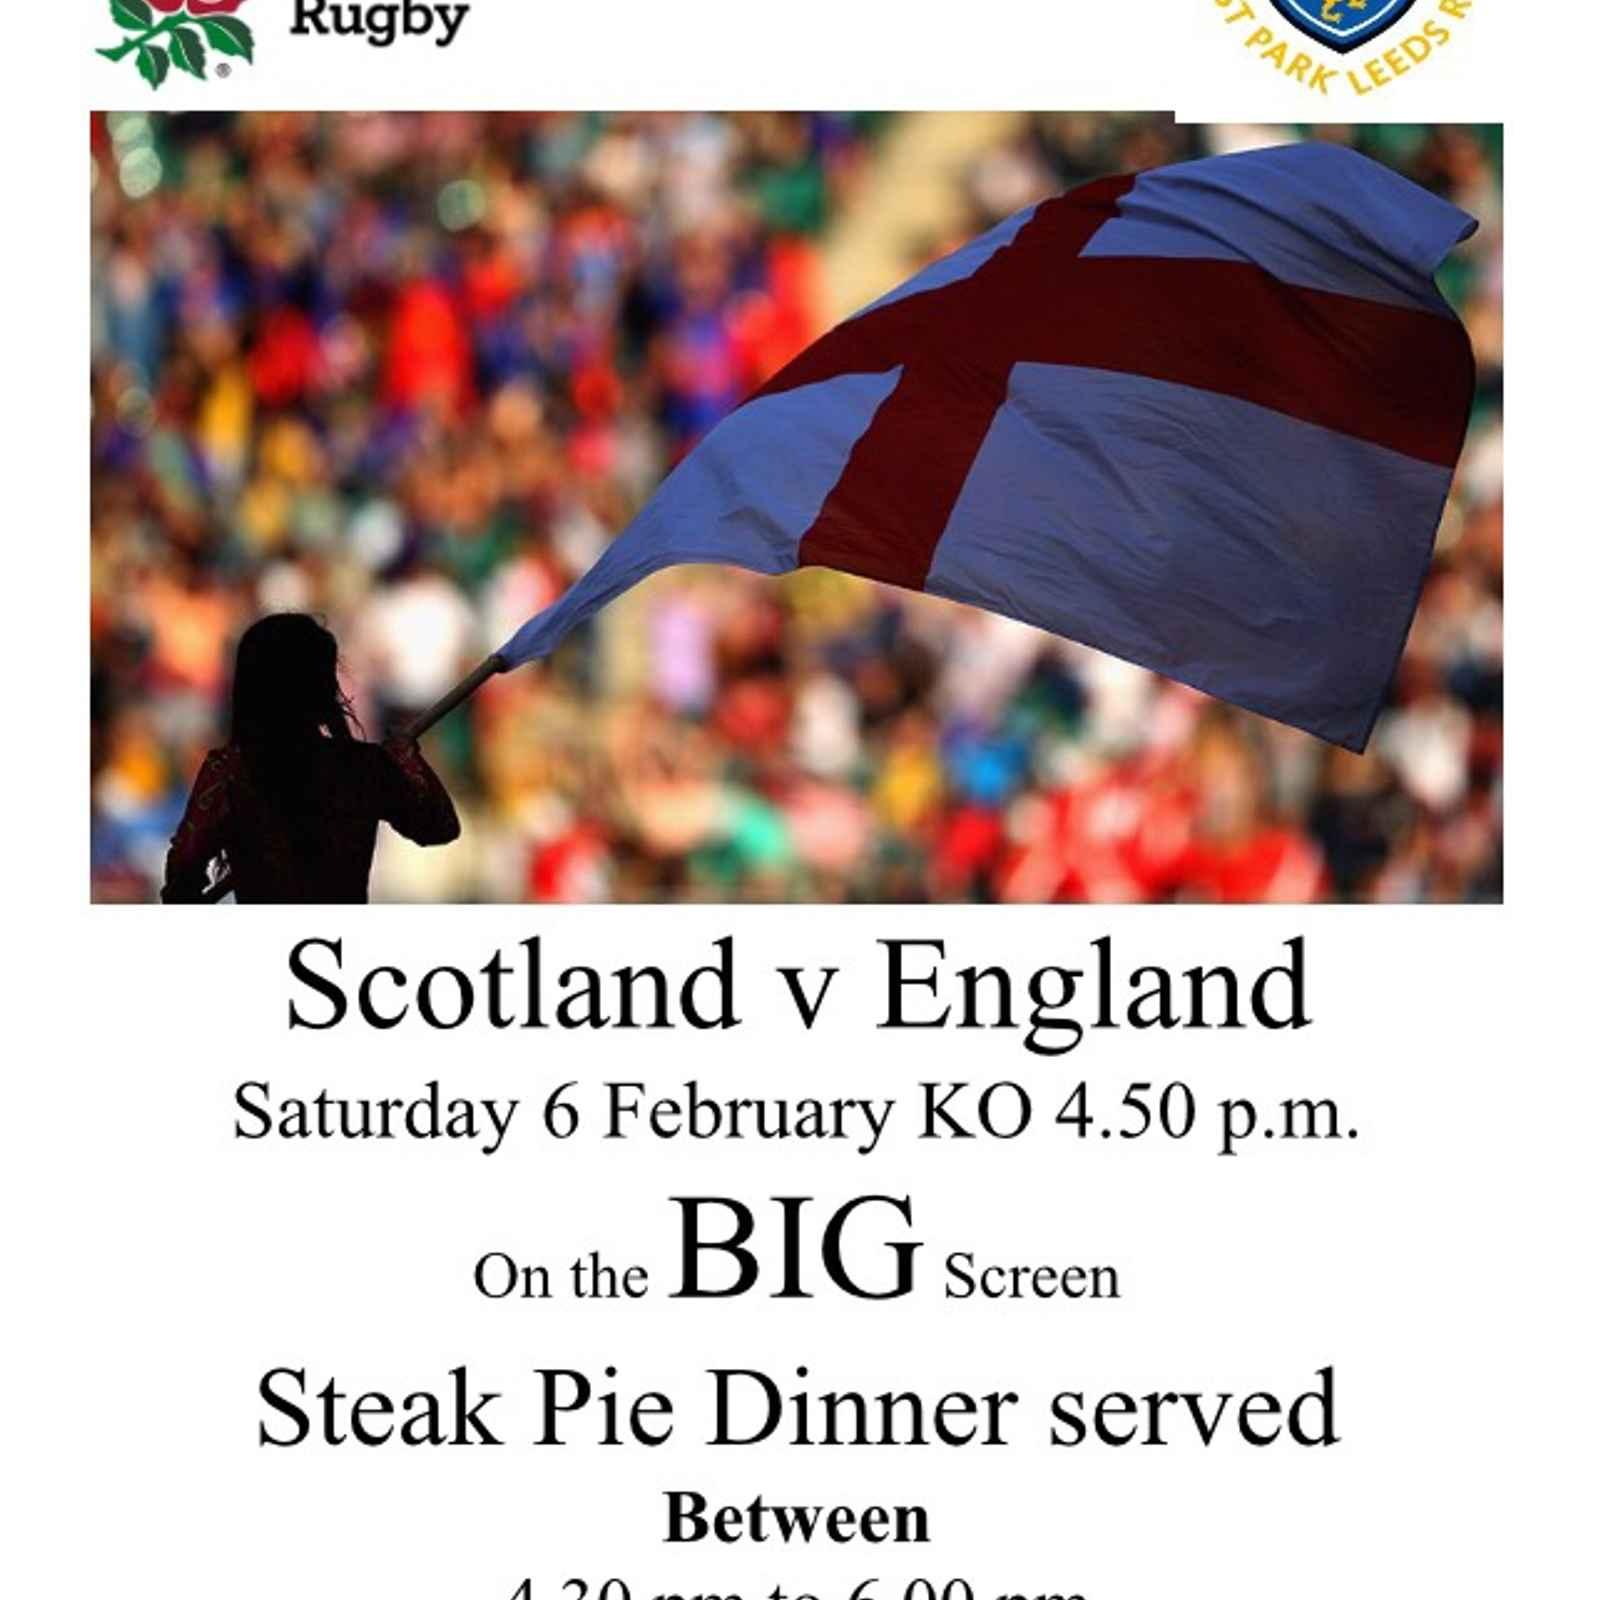 Scotland v England on the BIG screen